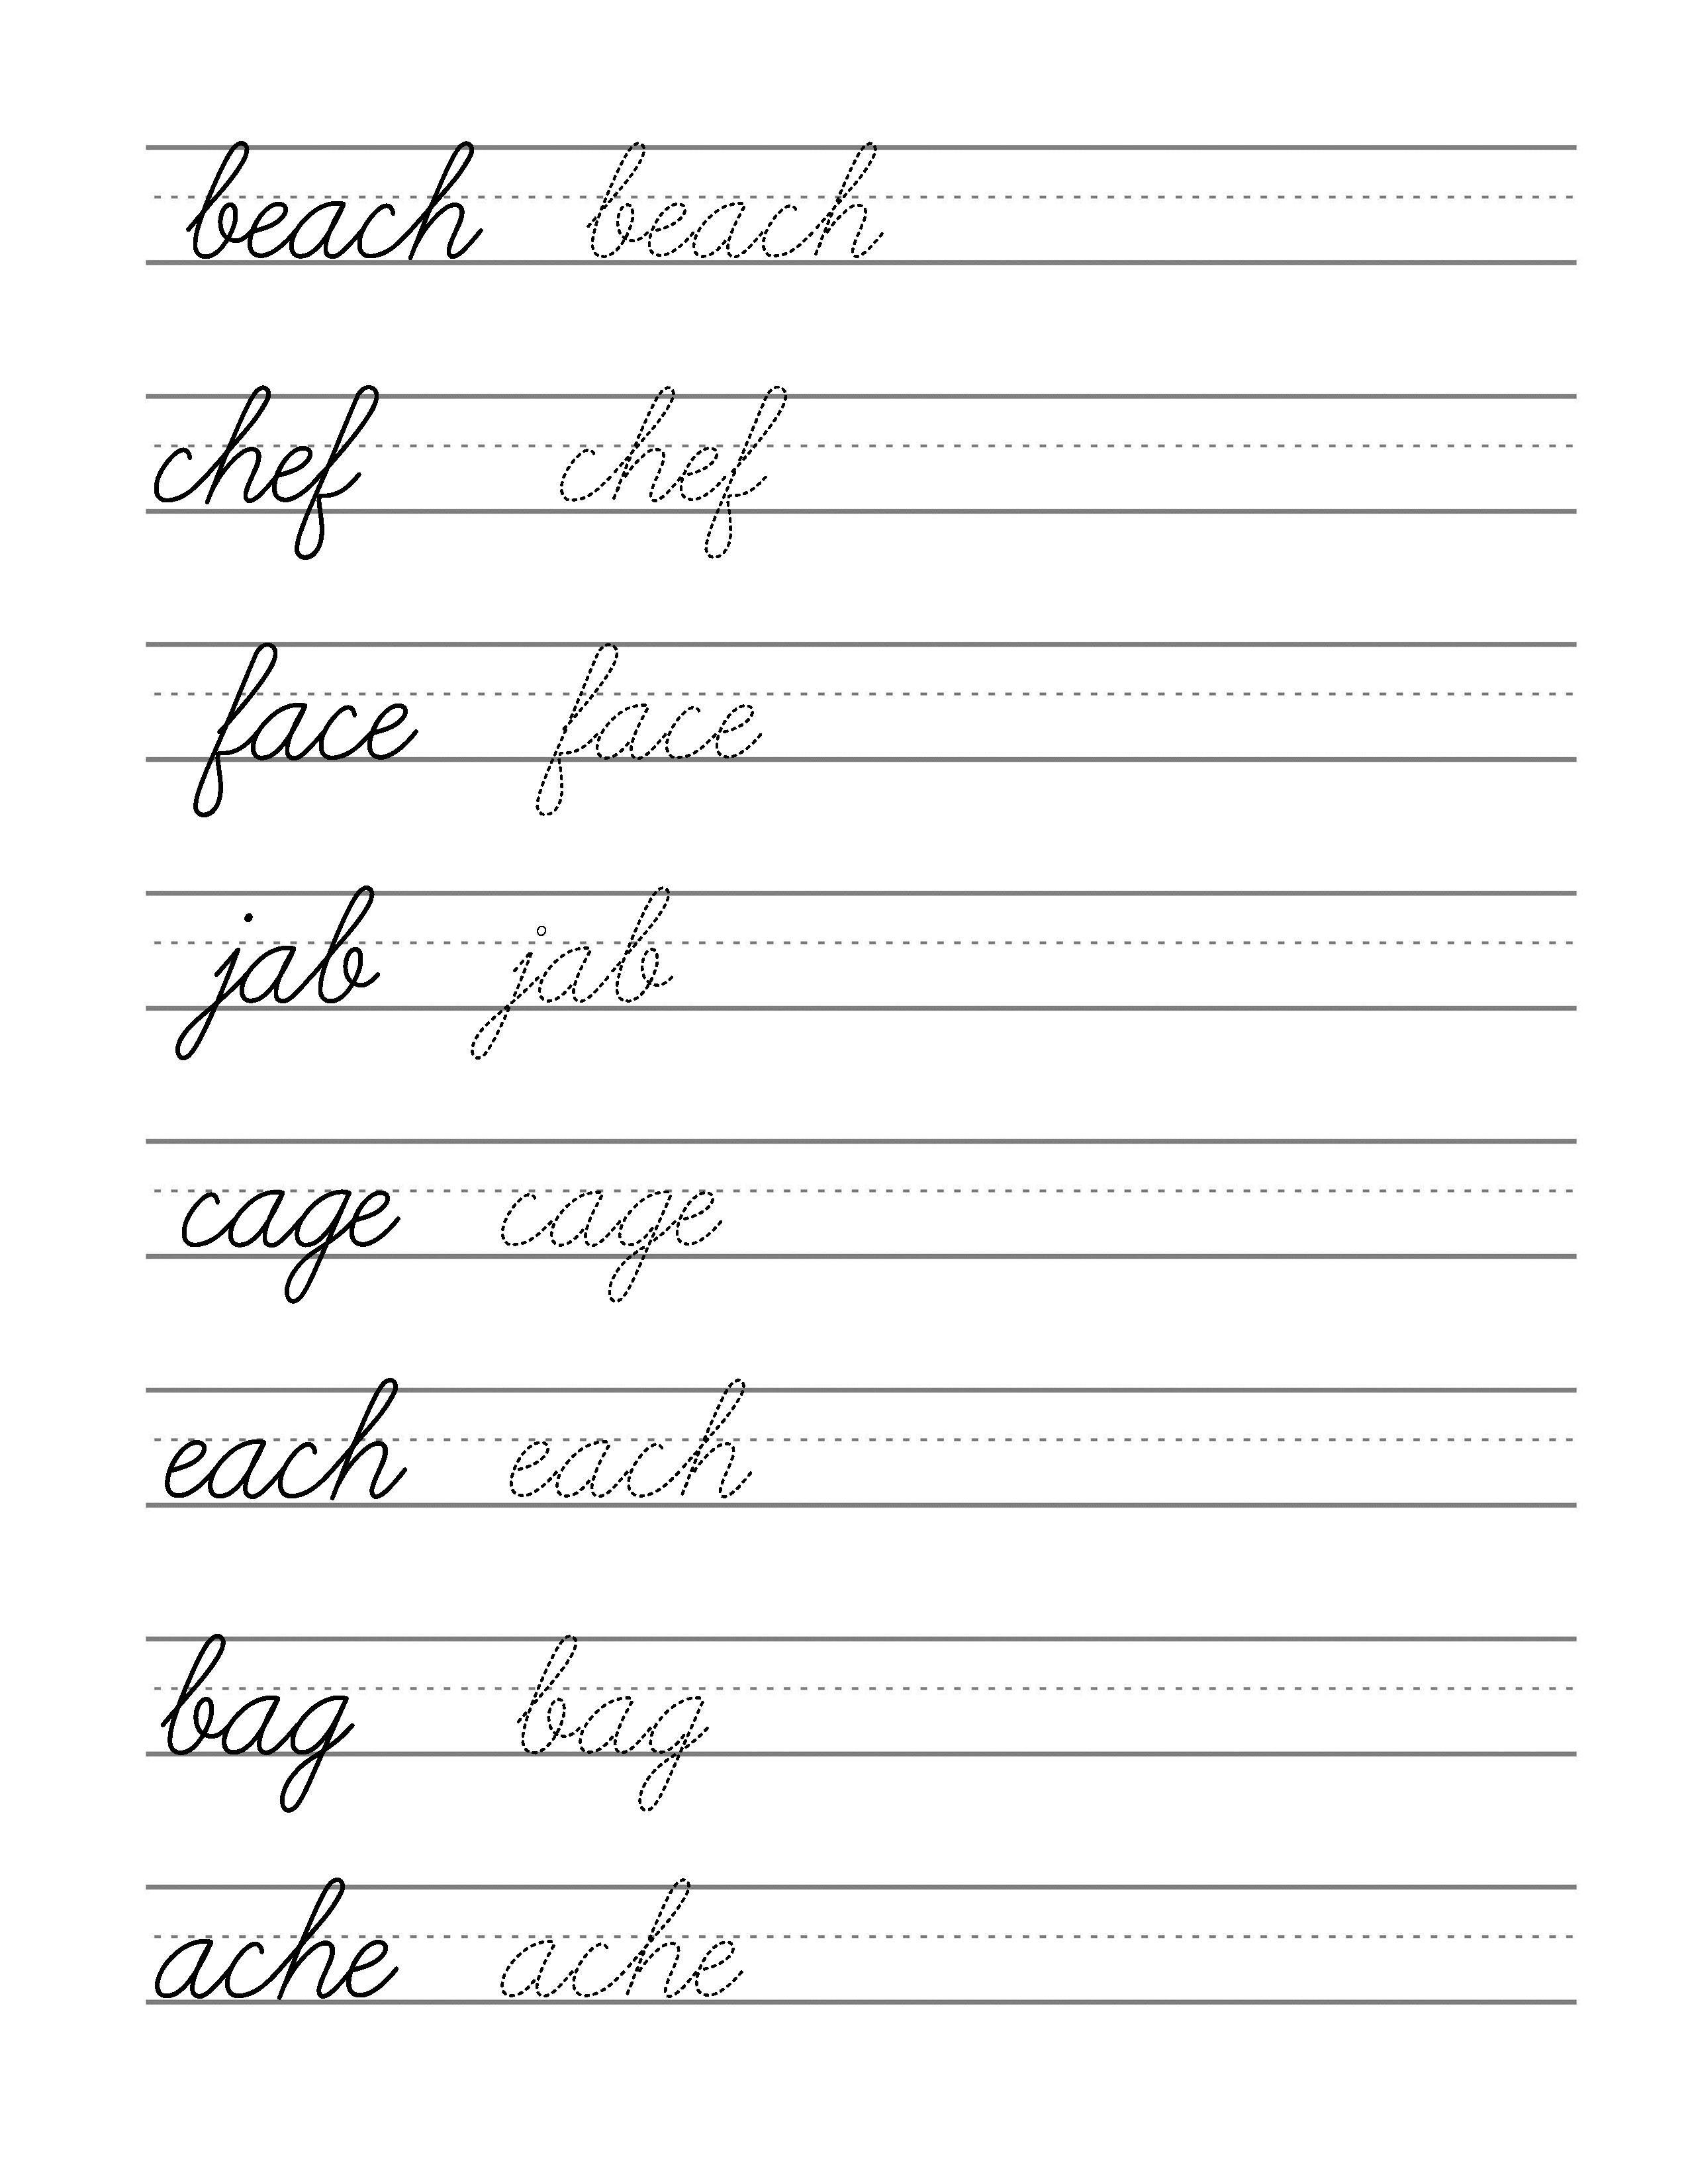 Free Beginning Cursive - Writing Template Part 3 | Writing - Free Printable Cursive Writing Paragraphs